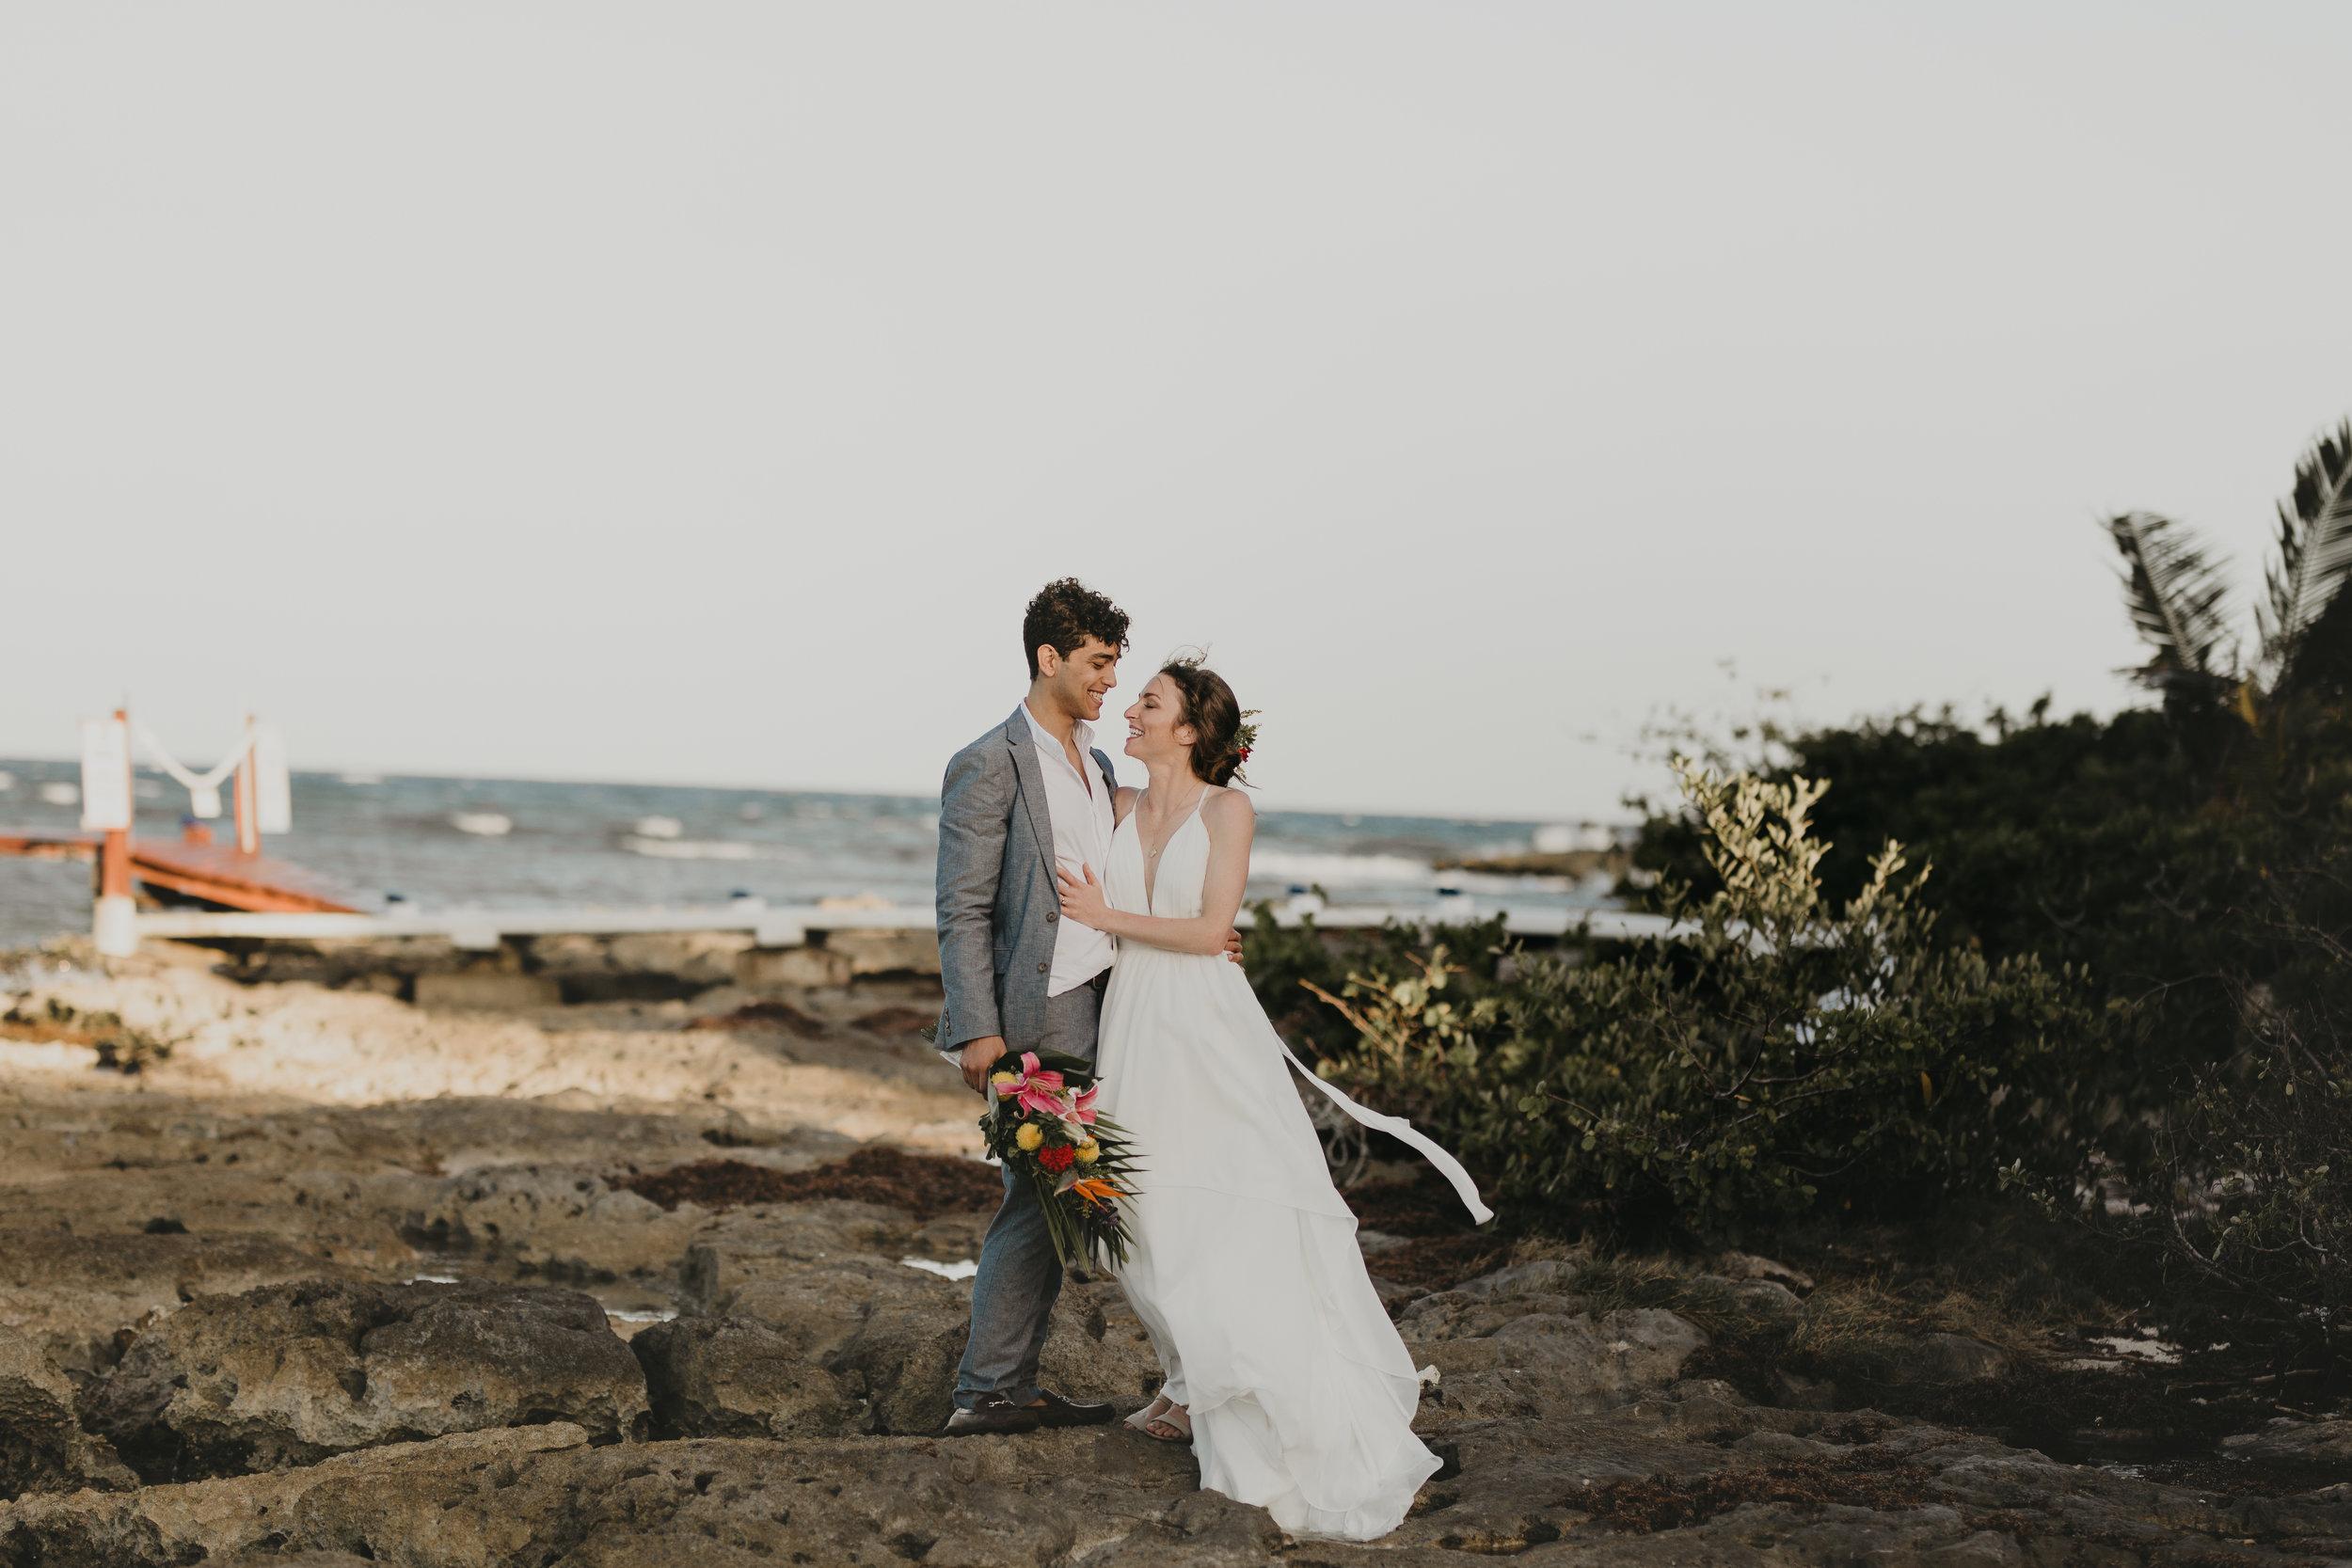 Nicole-Daacke-Photography-beachfront-akumal-destionation-wedding-tulum-mexico-elopement-photographer-destination-wedding-inspiration-sunset-champagne-pop-boho-bride-ocean-tropical-bohemian-tulum-wedding-photos-182.jpg